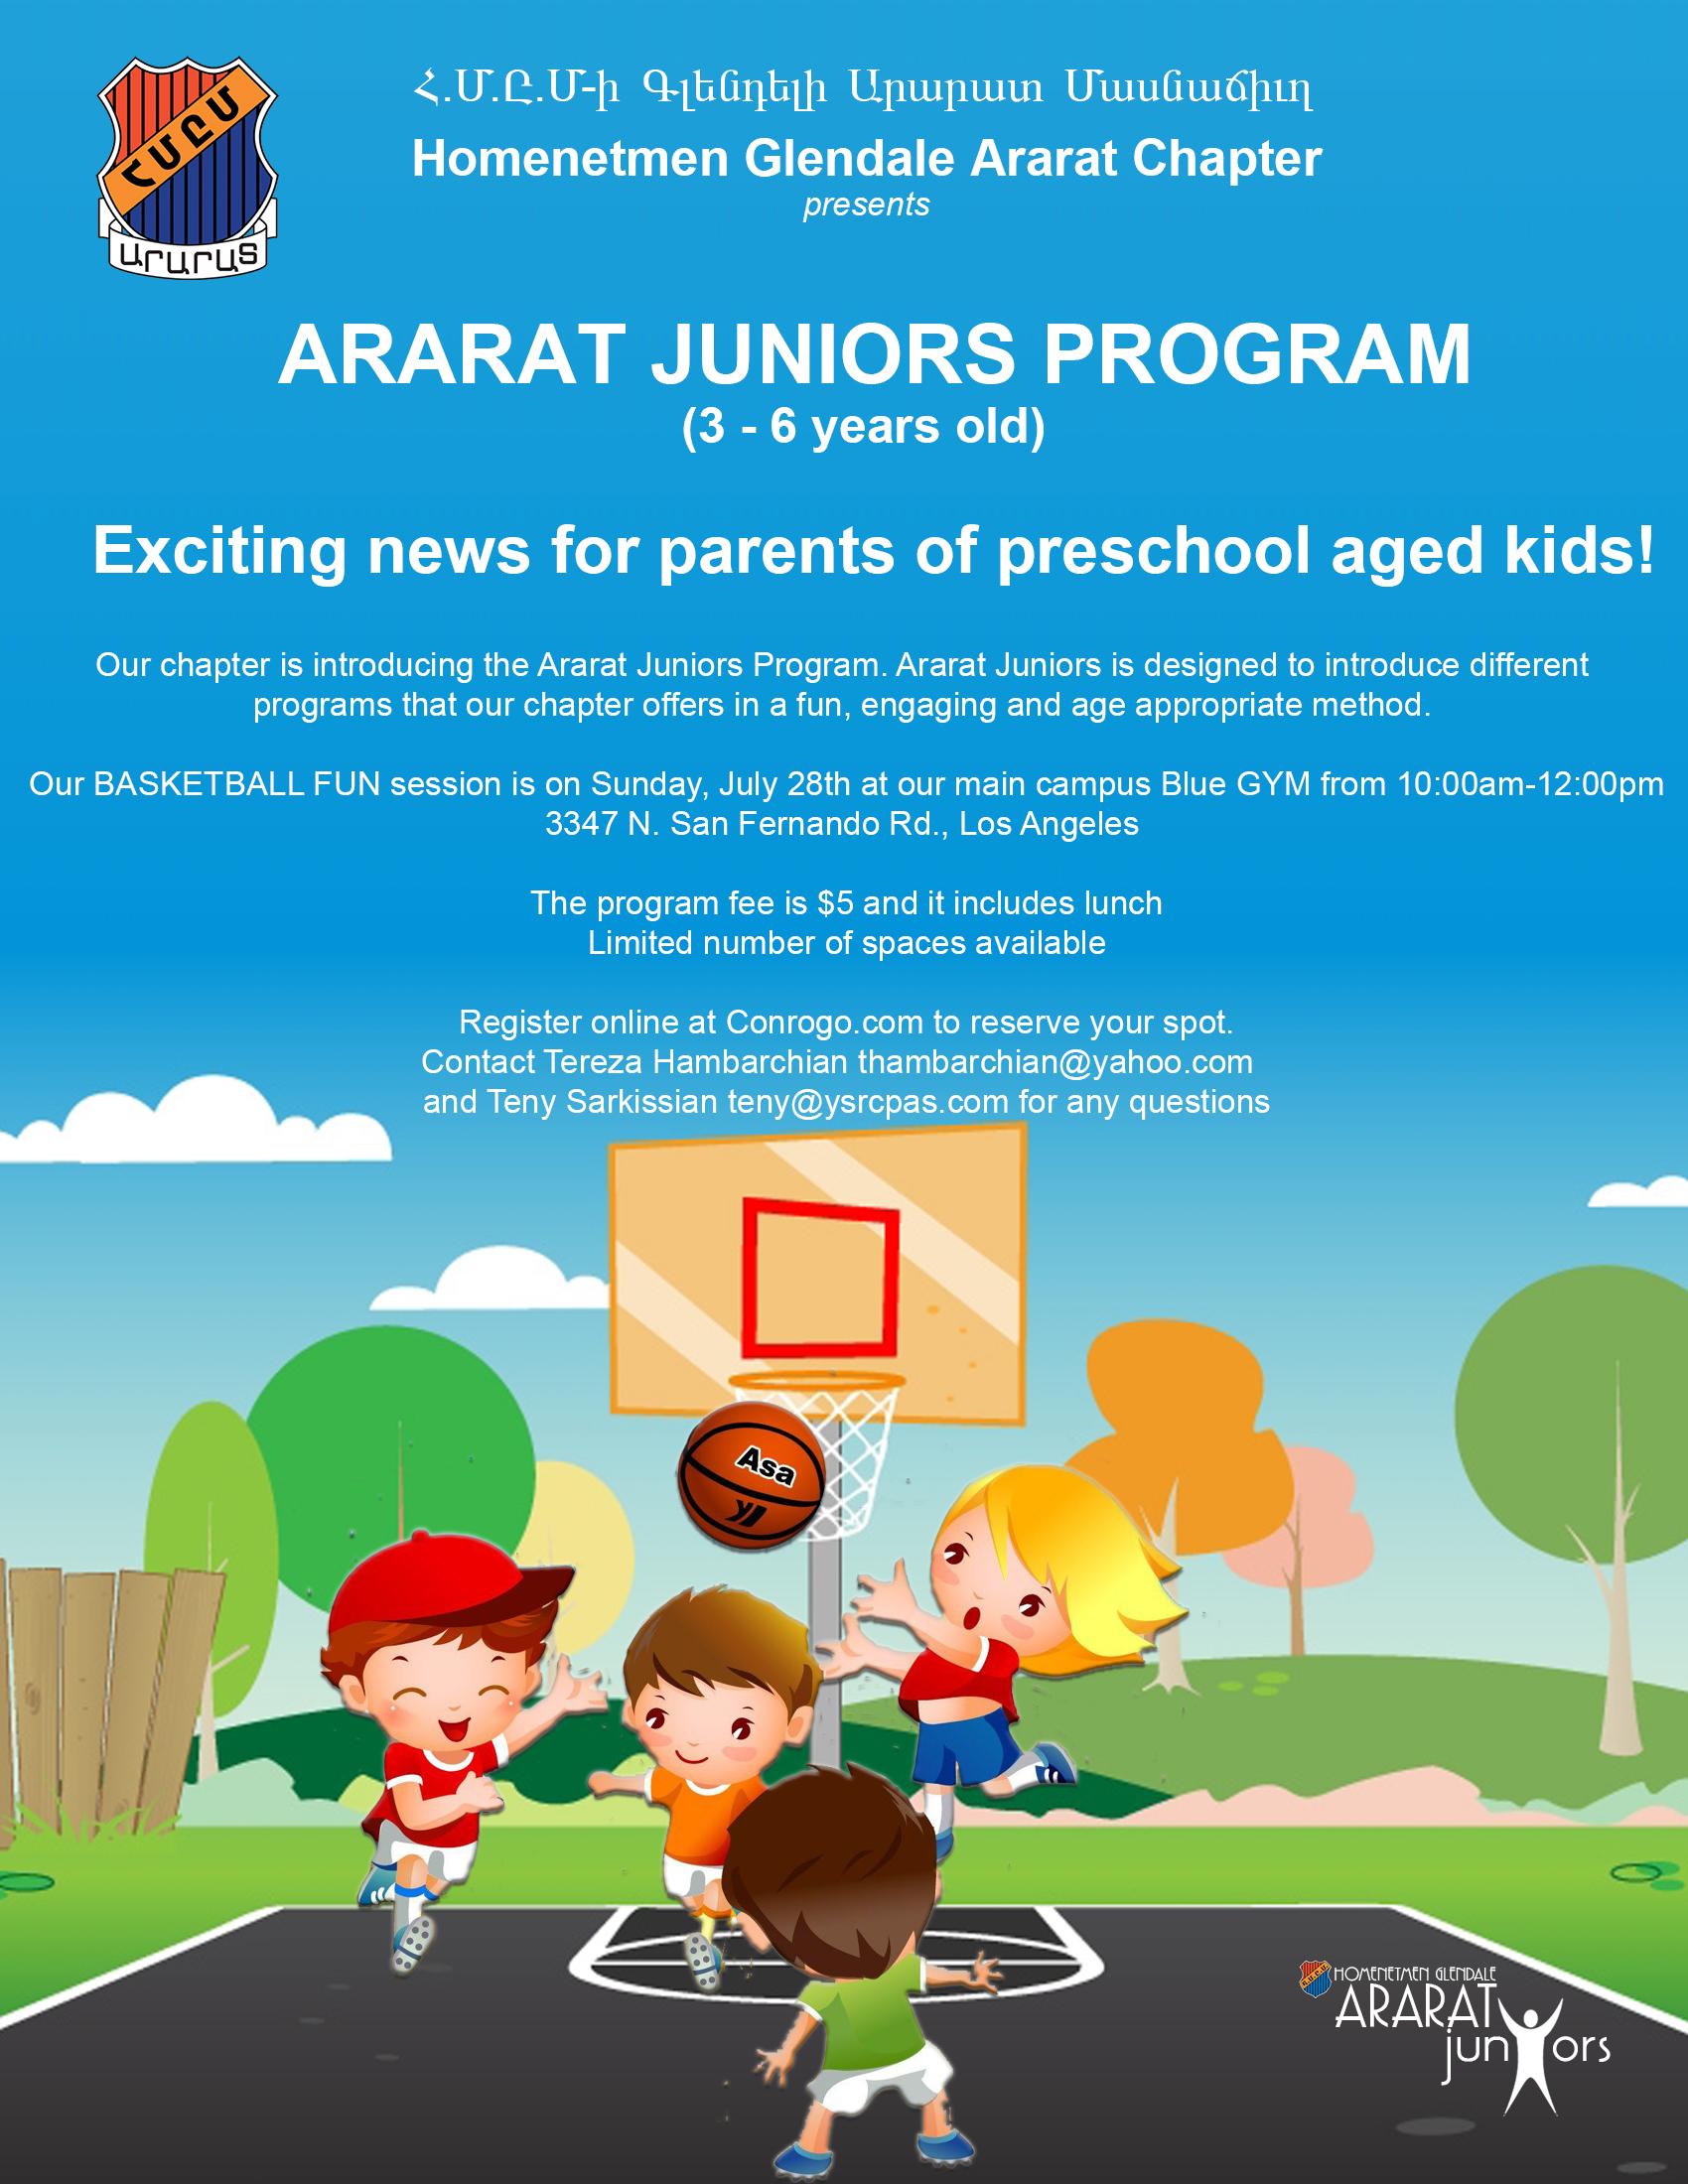 Ararat Juniors Program - Basketball